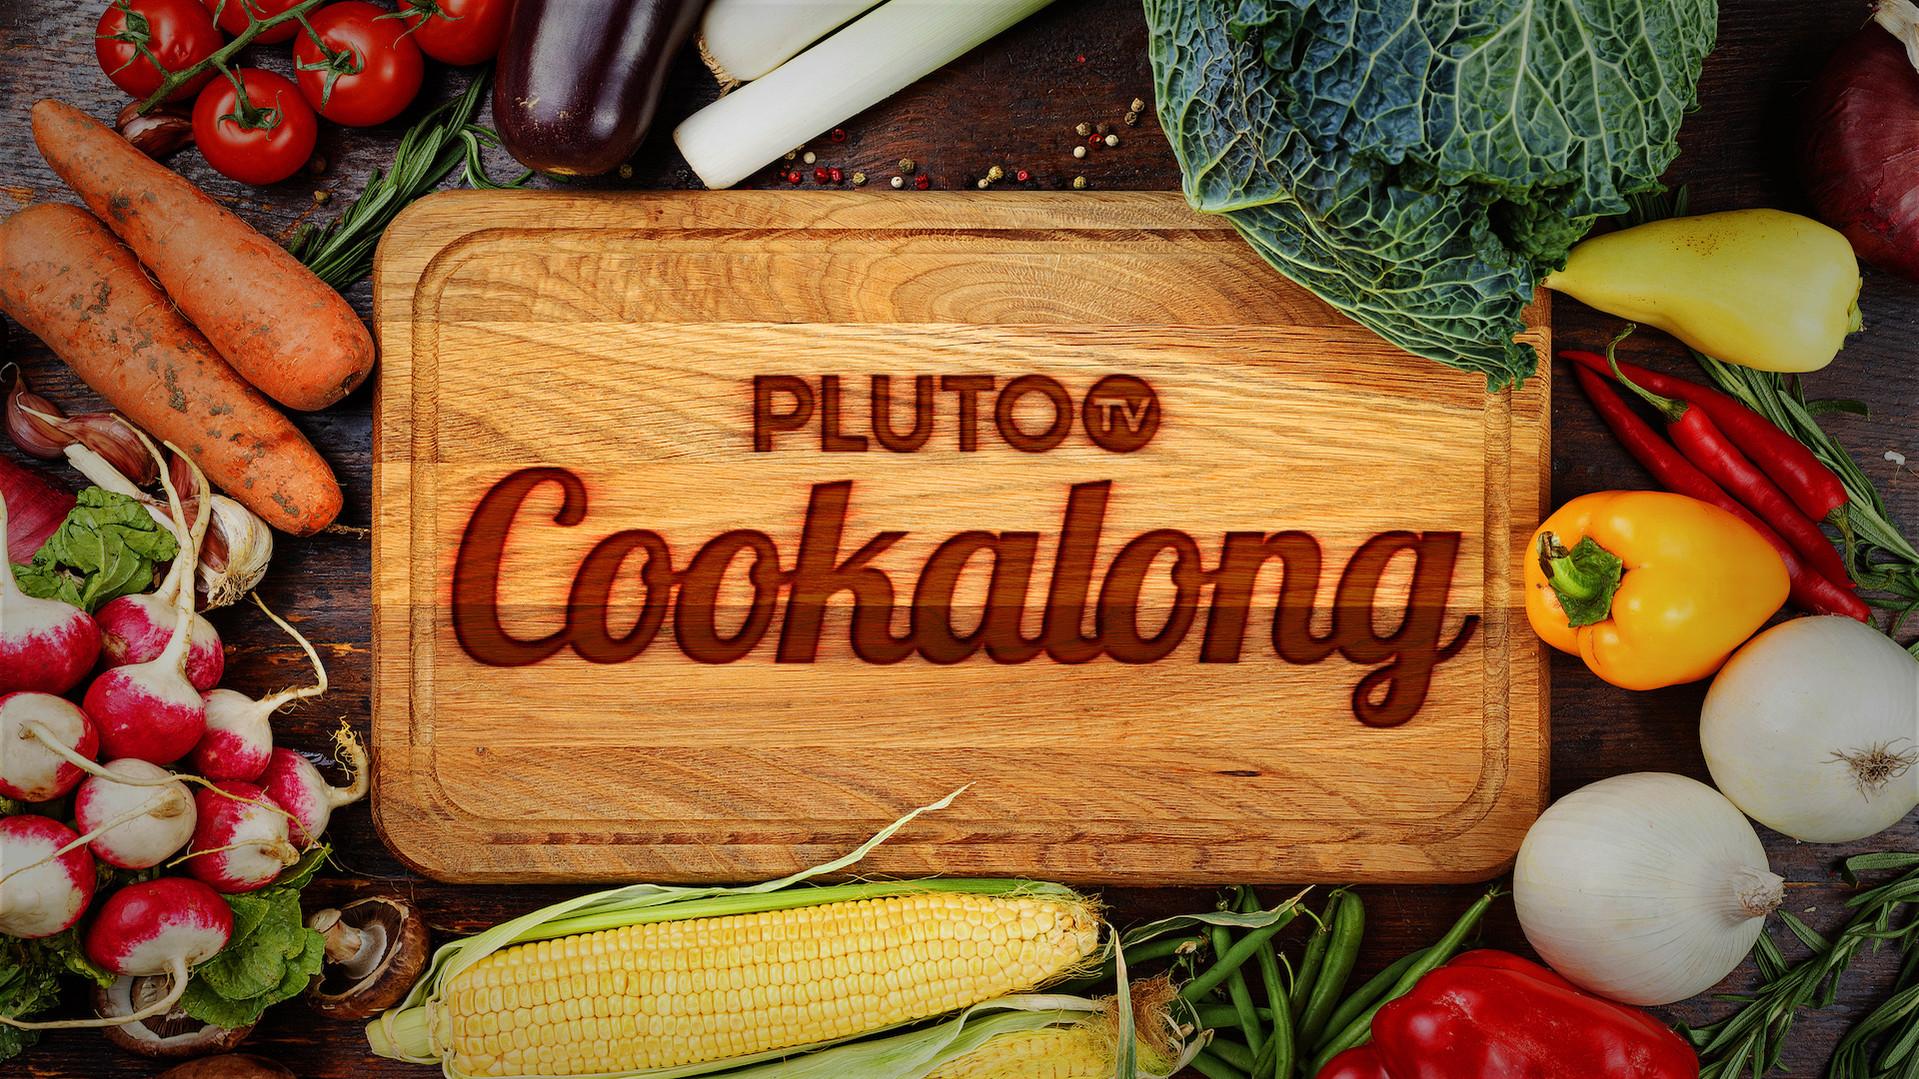 Pluto TV Cookalong_featuredImage.jpg